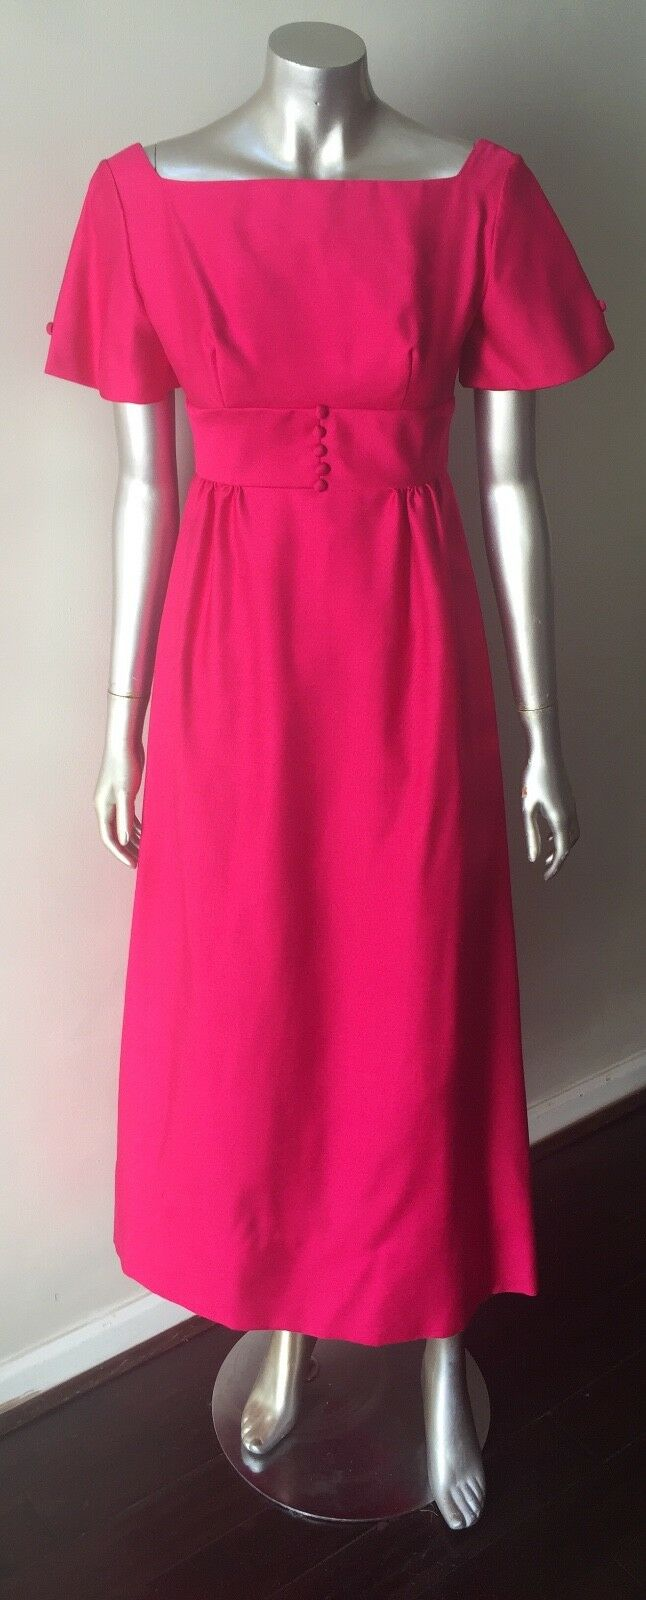 Mod Gogo Taffeta Vintage 60s Silk Wool Prom Pinkness Party Bow Dress Size Xs